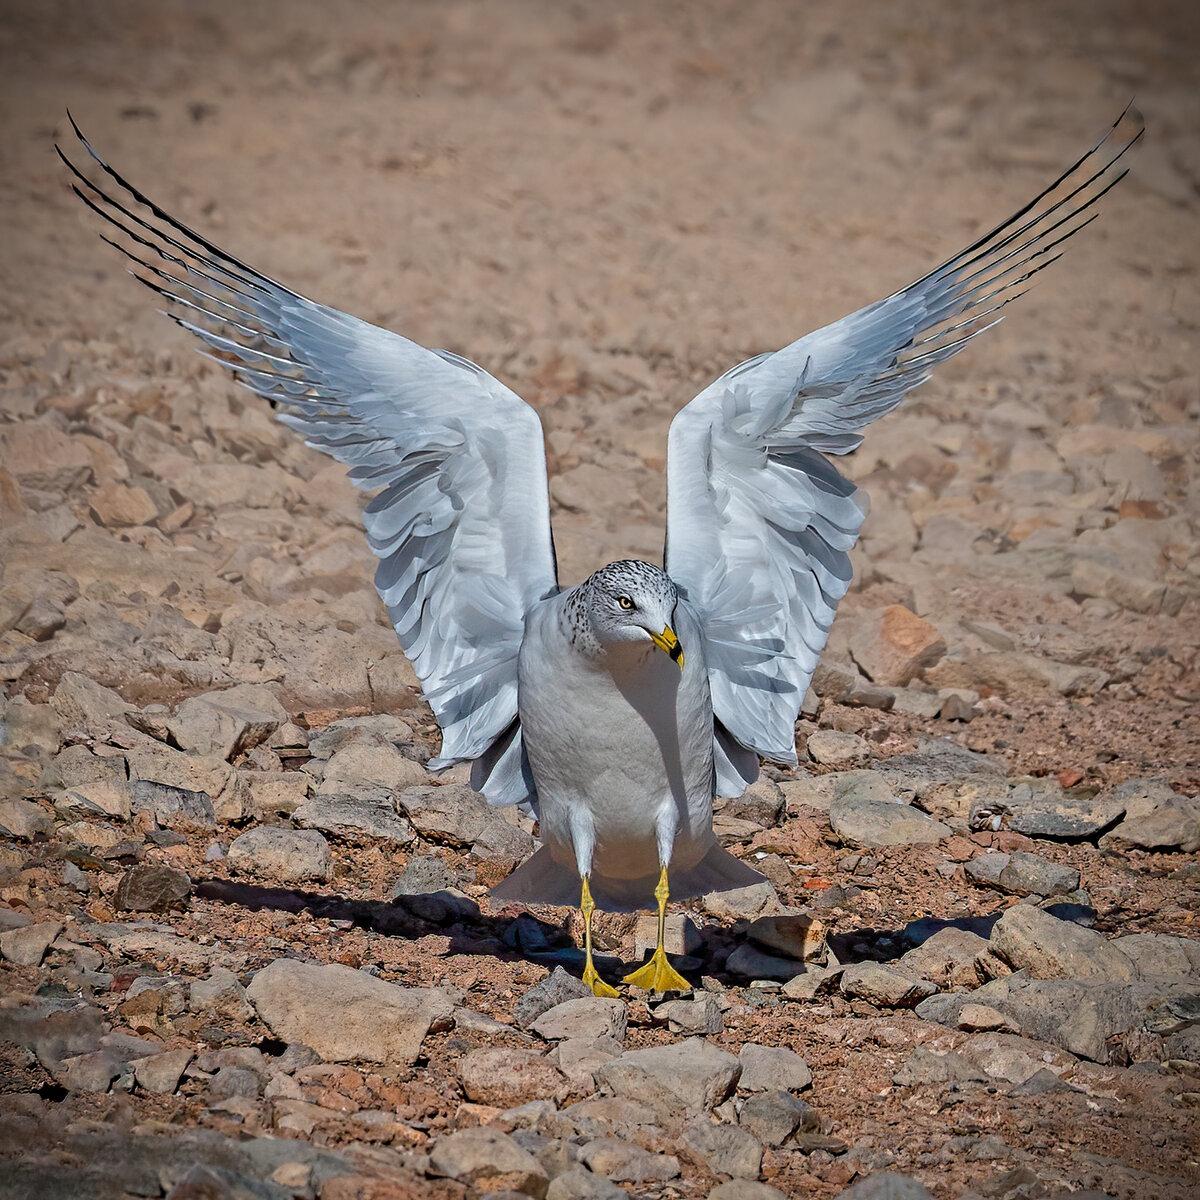 Ring-billed gull-9220-Edit.jpg